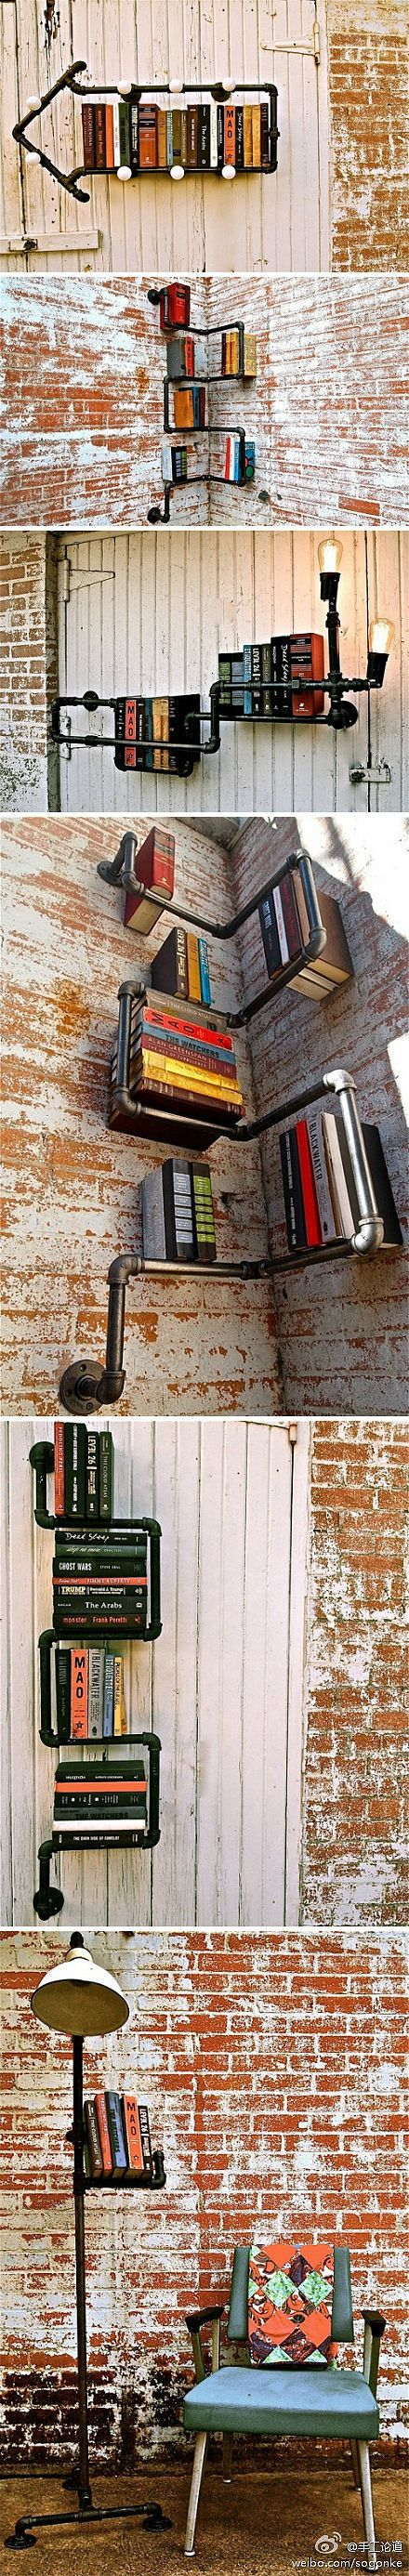 If I ever find myself needing shelfs for so few books, this is it! So awsome!